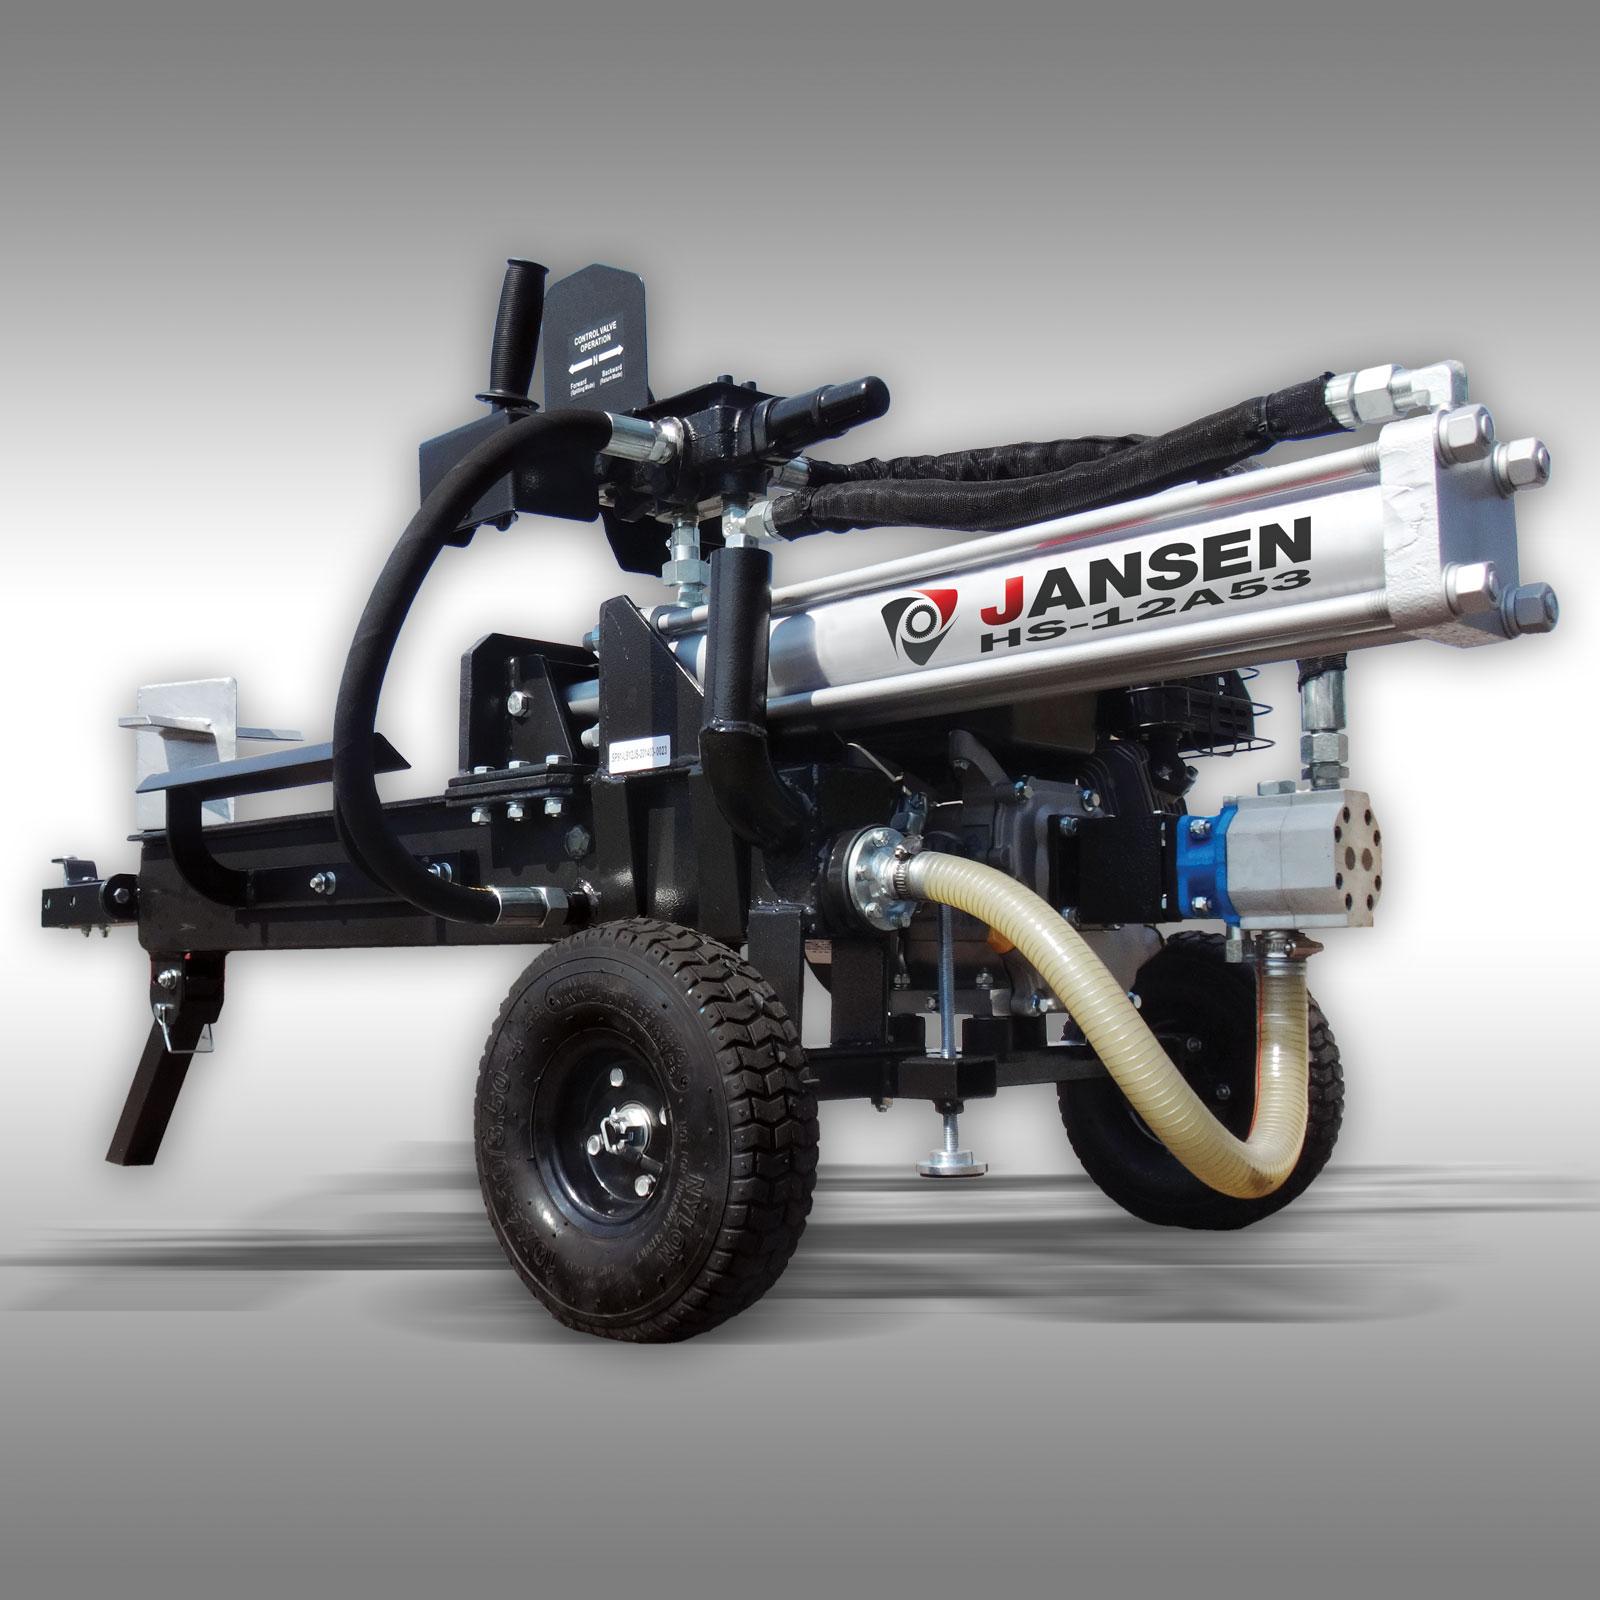 holzspalter jansen hs 12l53 12 t benzinmotor 6 5 ps. Black Bedroom Furniture Sets. Home Design Ideas